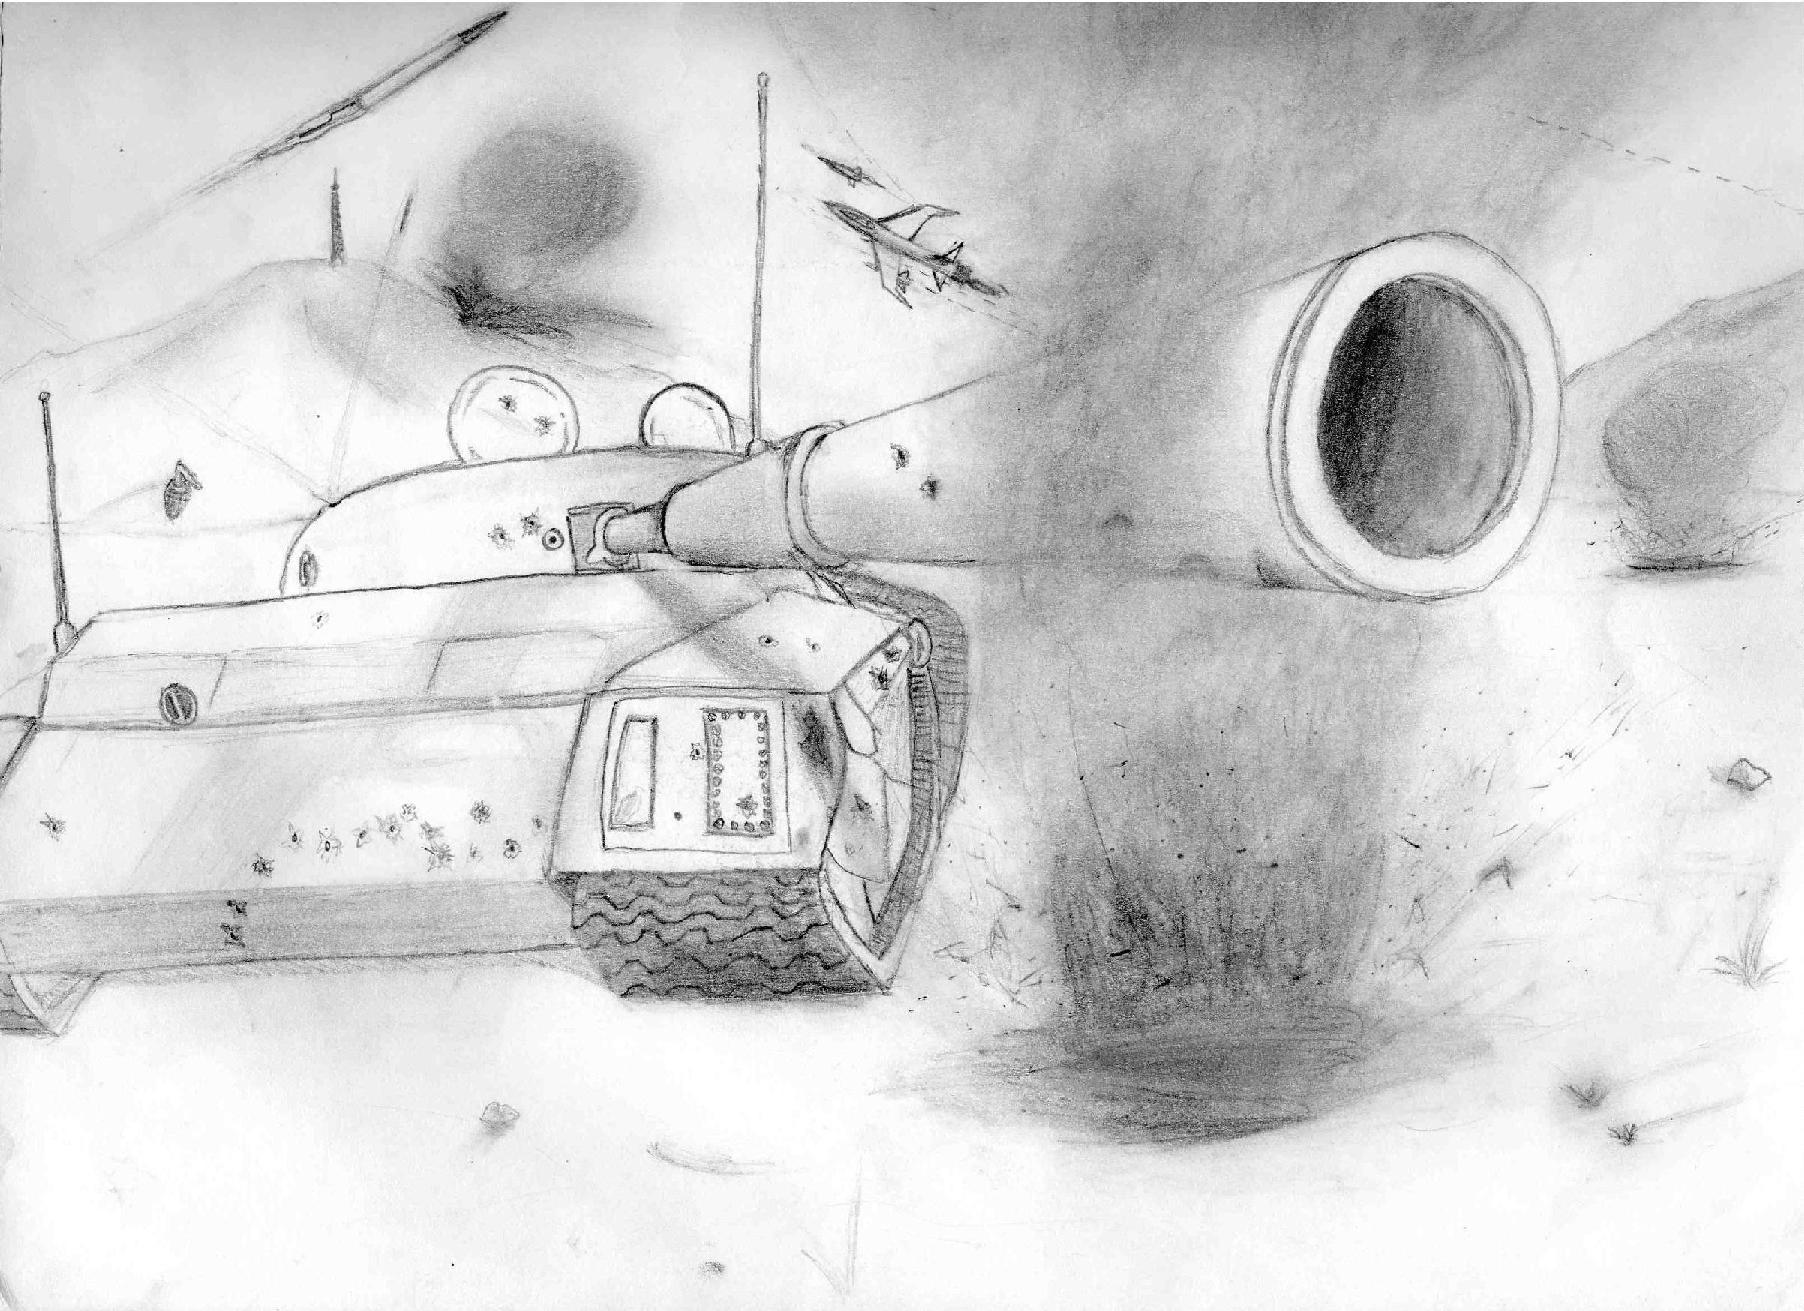 War - Tank